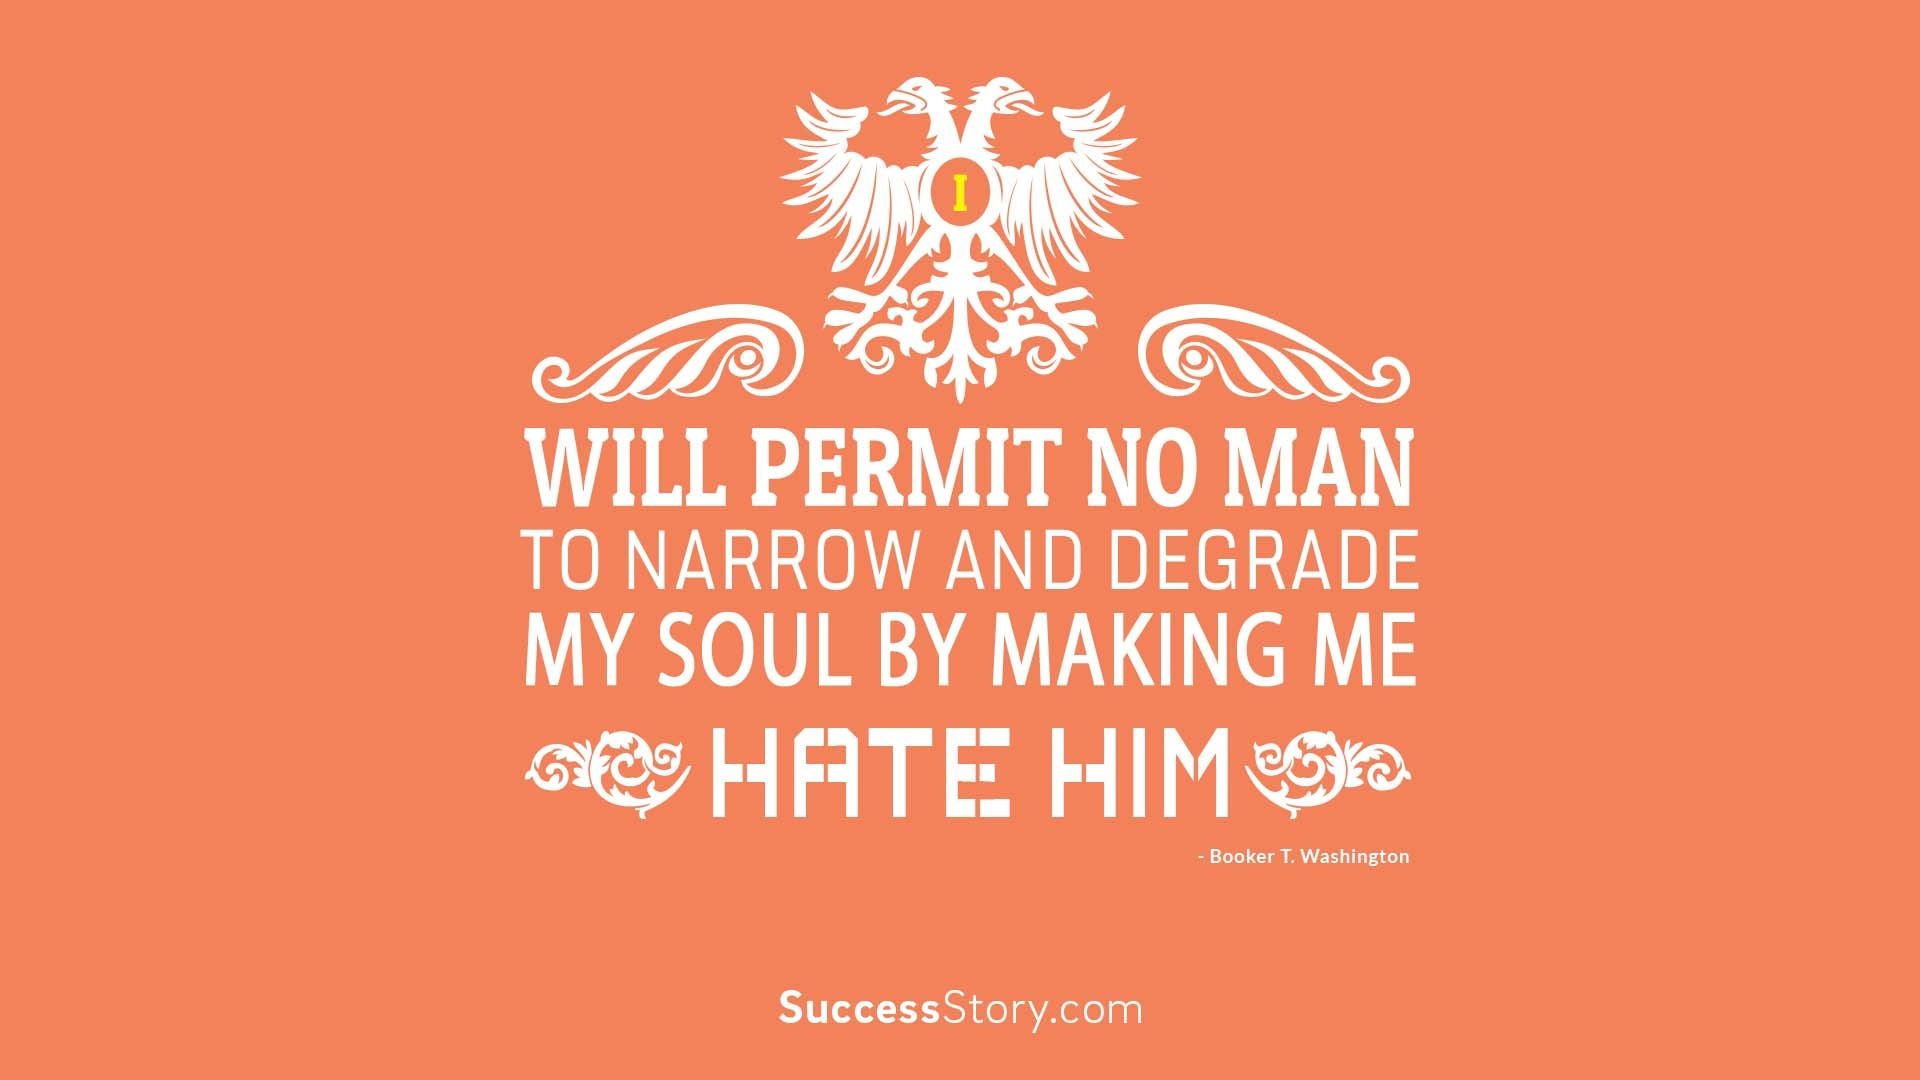 I will permit no man  1